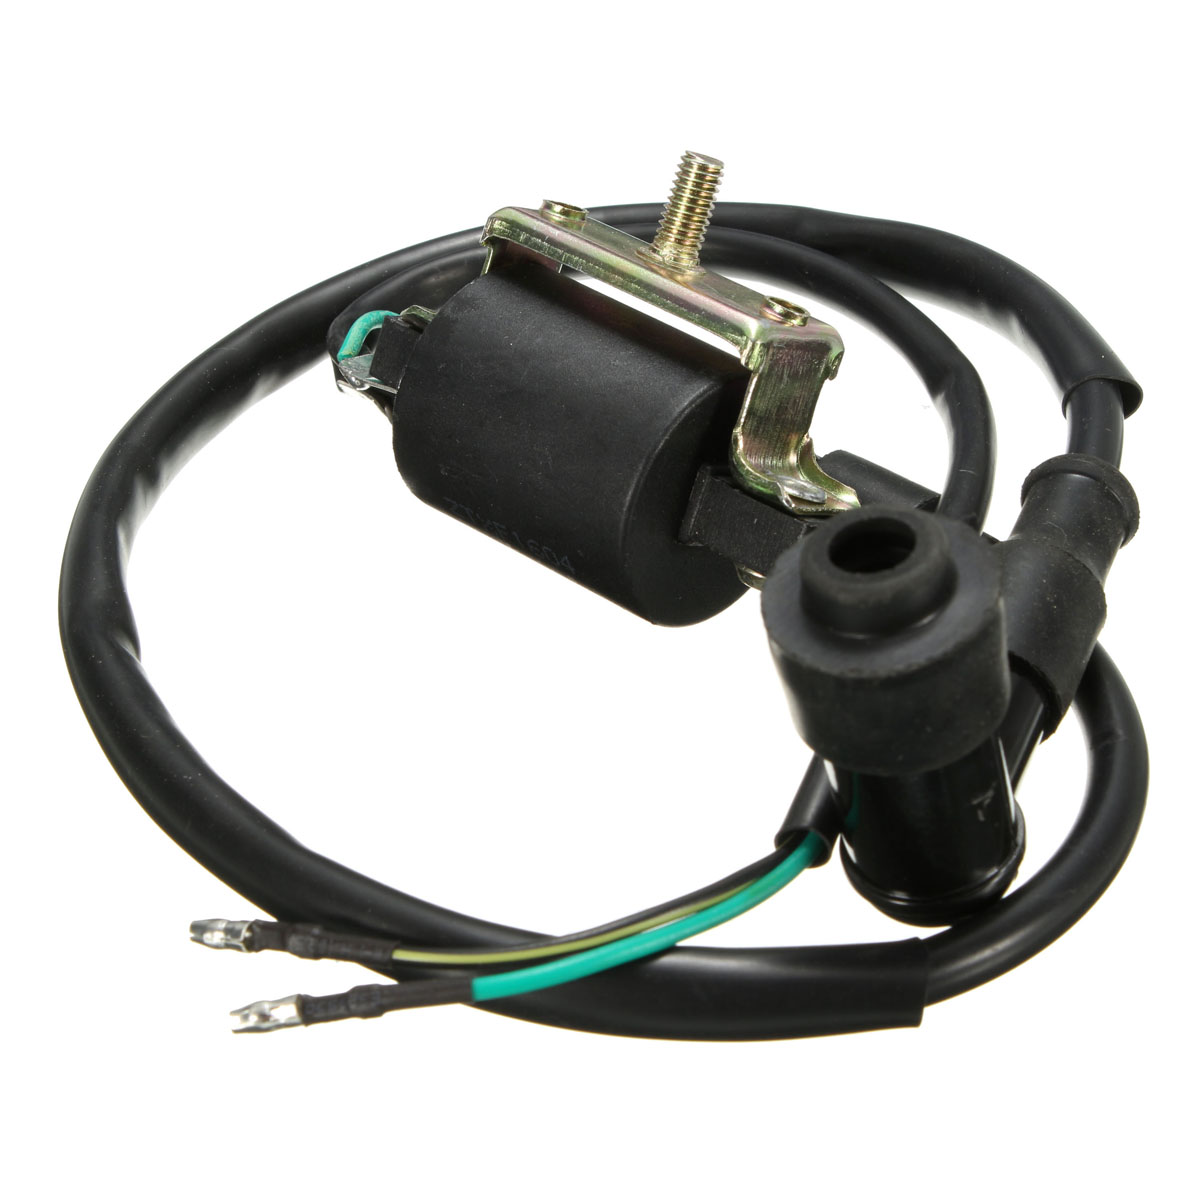 Wiring Loom Kill Switch Coil CDI Spark Plug Kit For 110cc 125cc 140cc Pit Bike